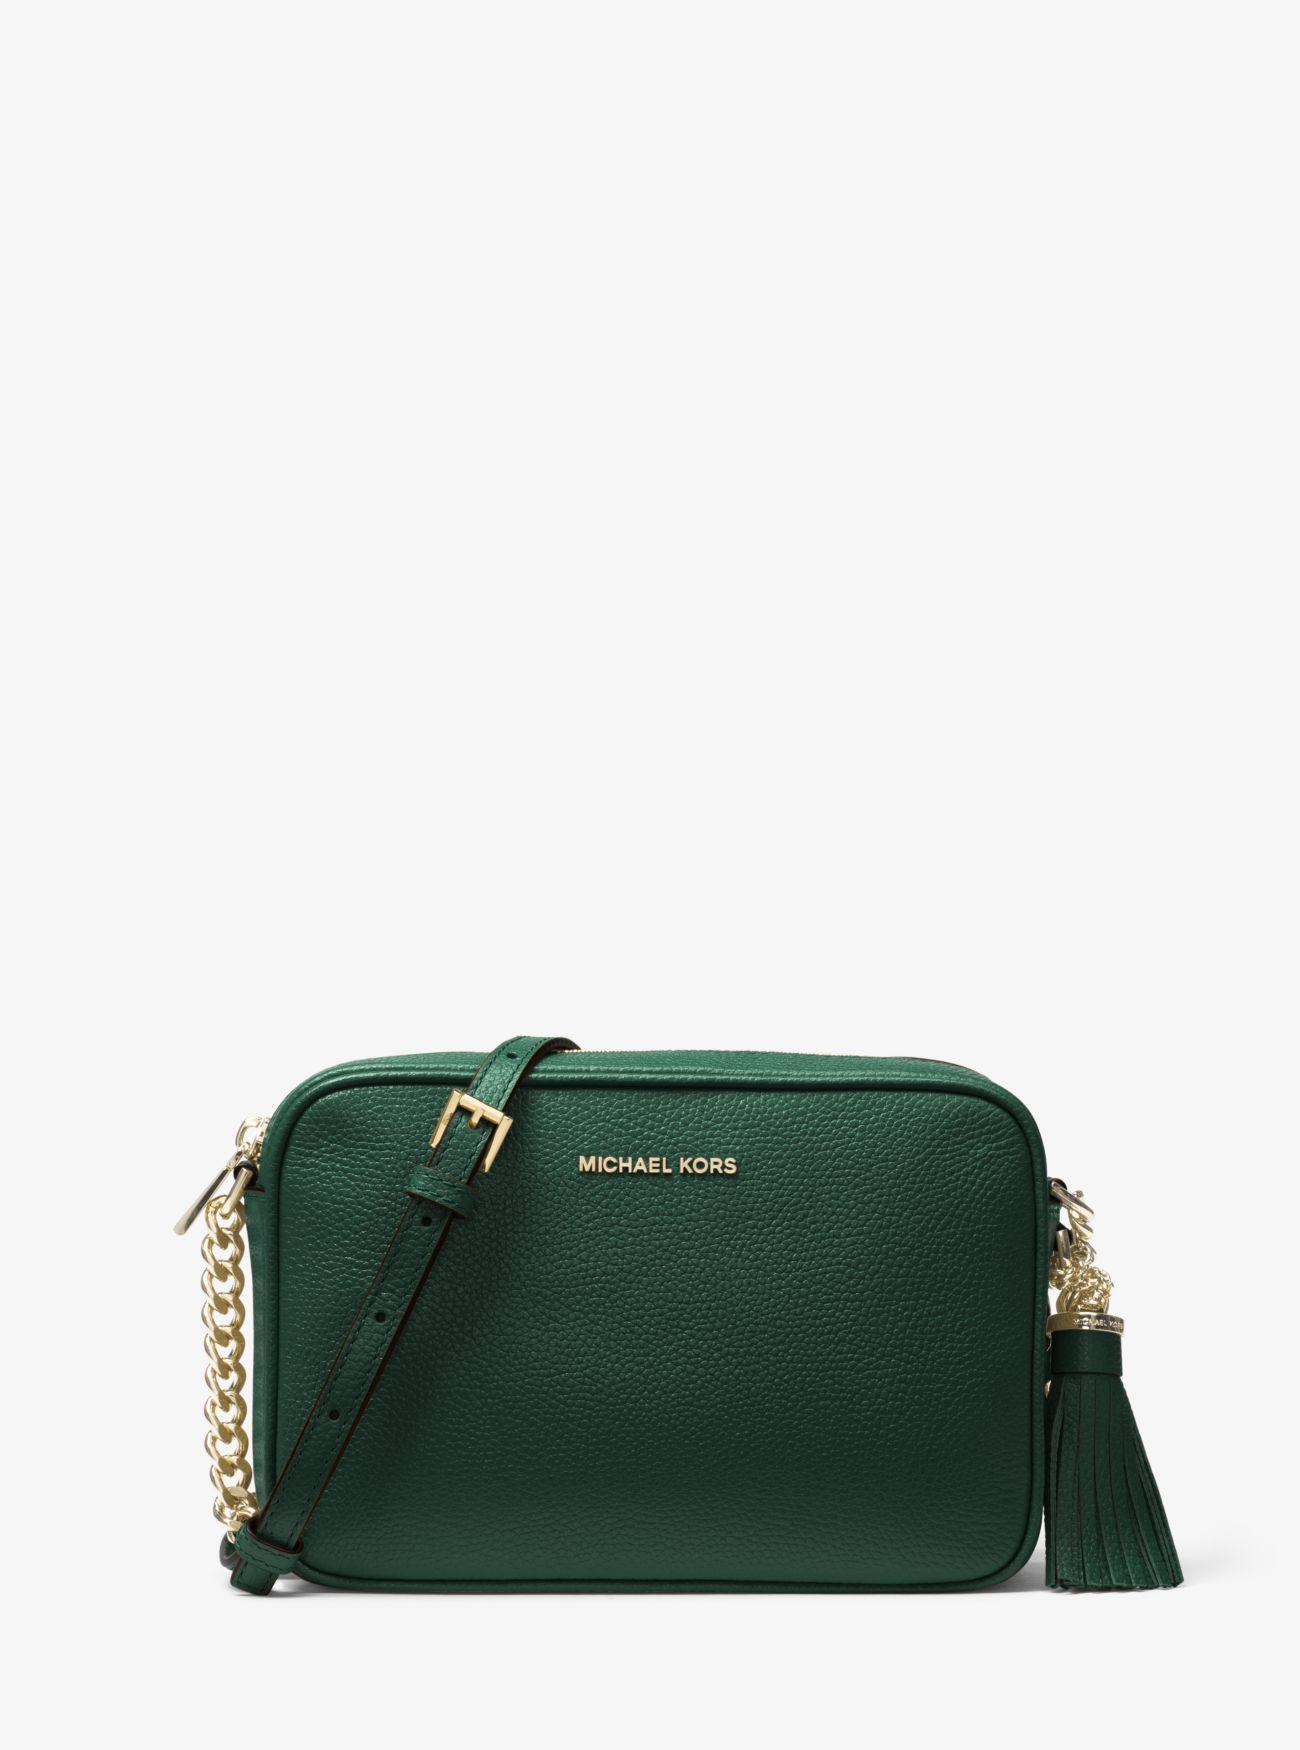 9b04e007e230 Ginny Leather Crossbody Bag Ginny Leather Crossbody Bag Ginny Leather  Crossbody Bag. MICHAEL Michael Kors